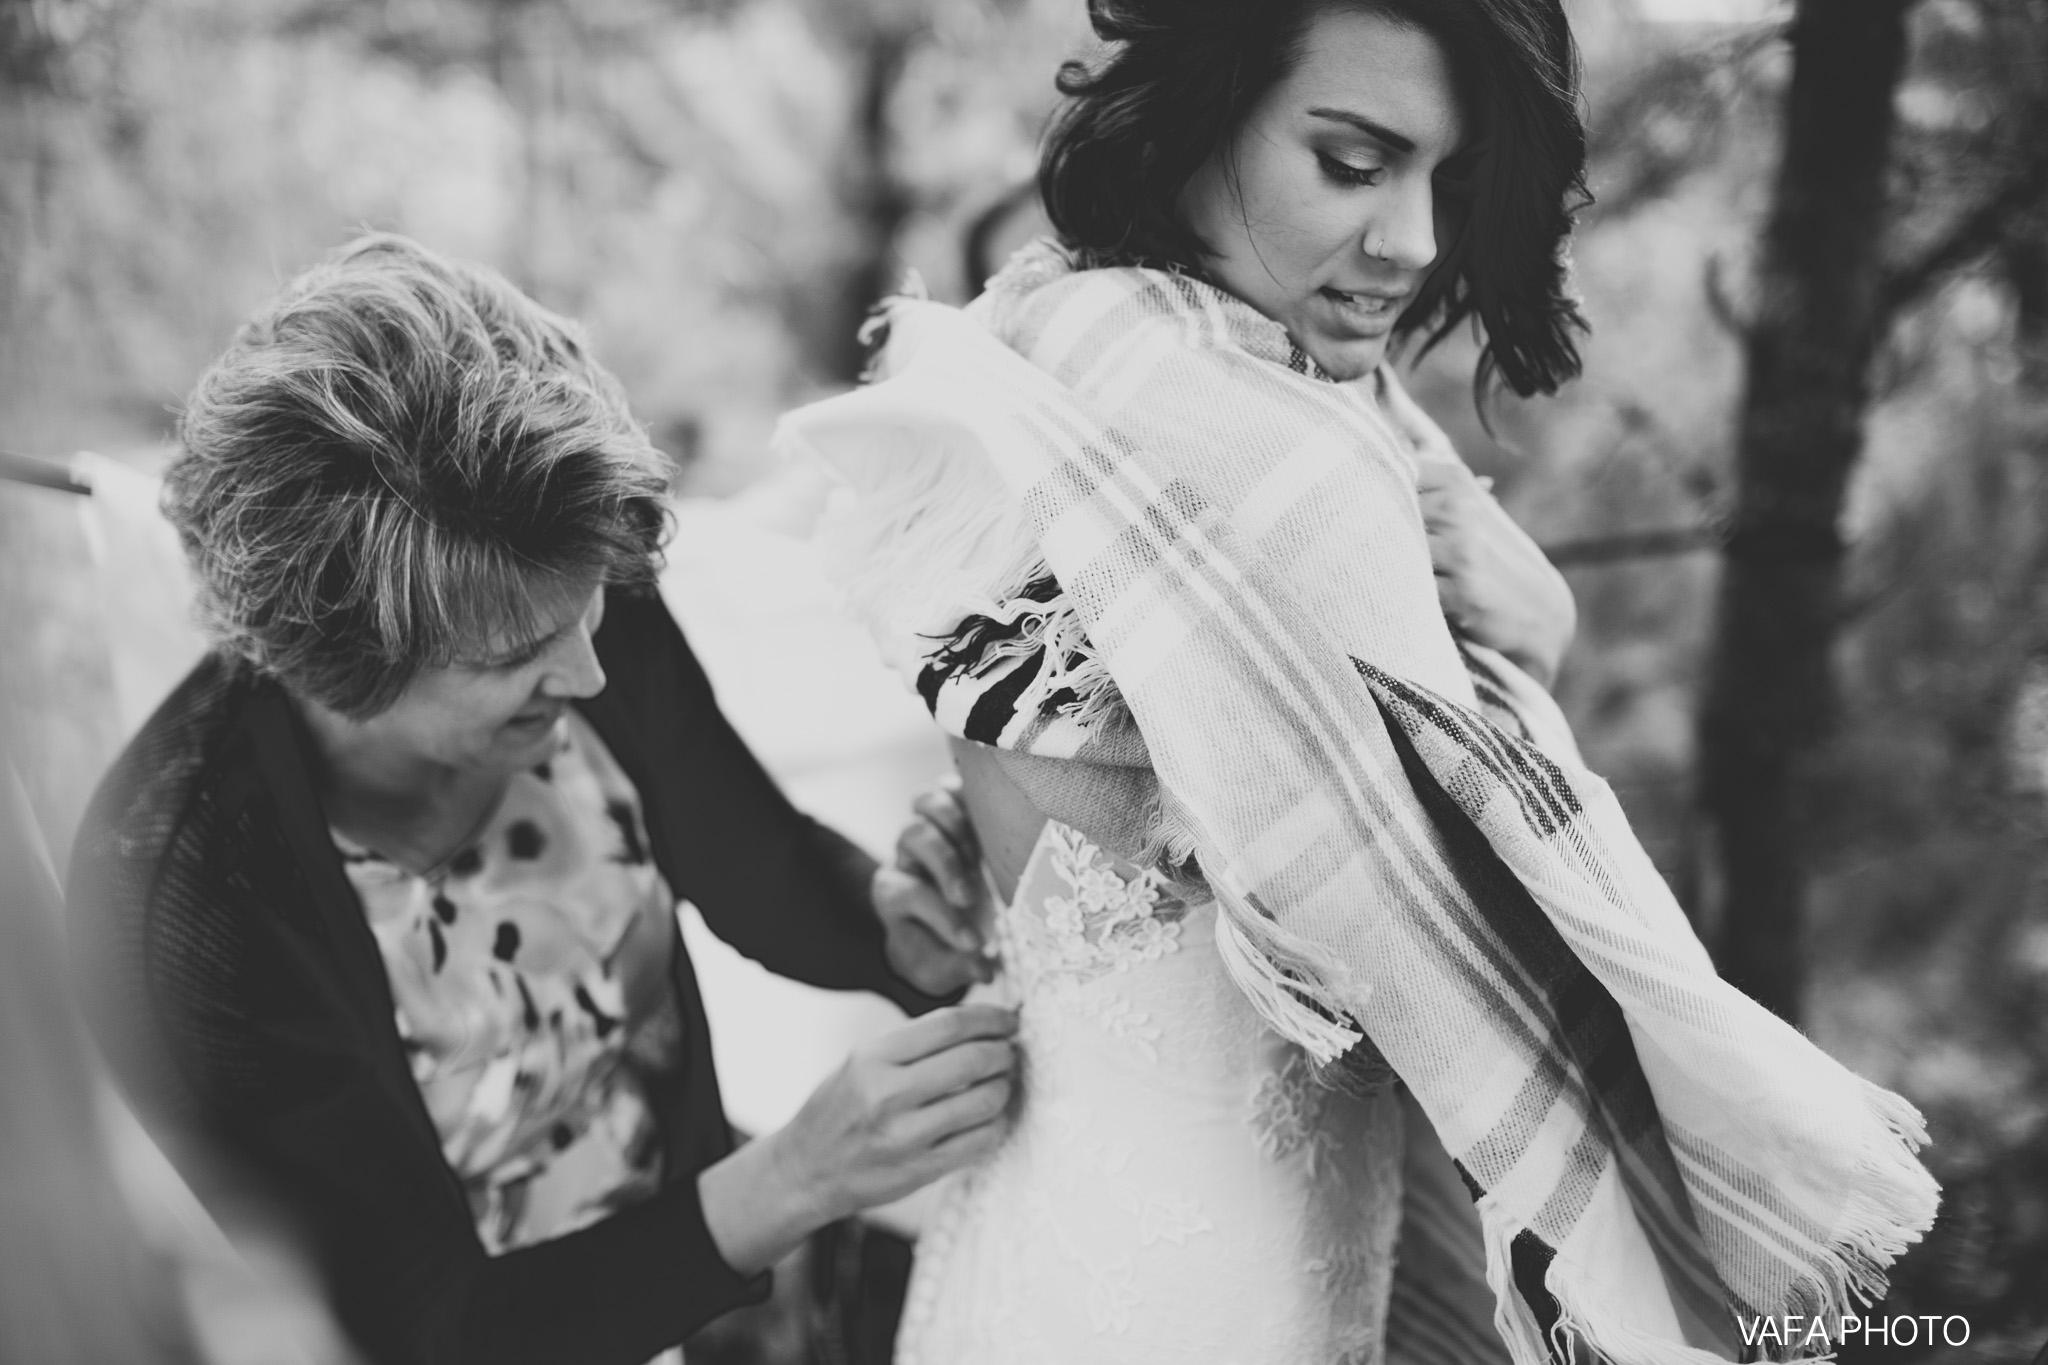 Hogback-Mountain-Wedding-Chelsea-Josh-Vafa-Photo-77.jpg